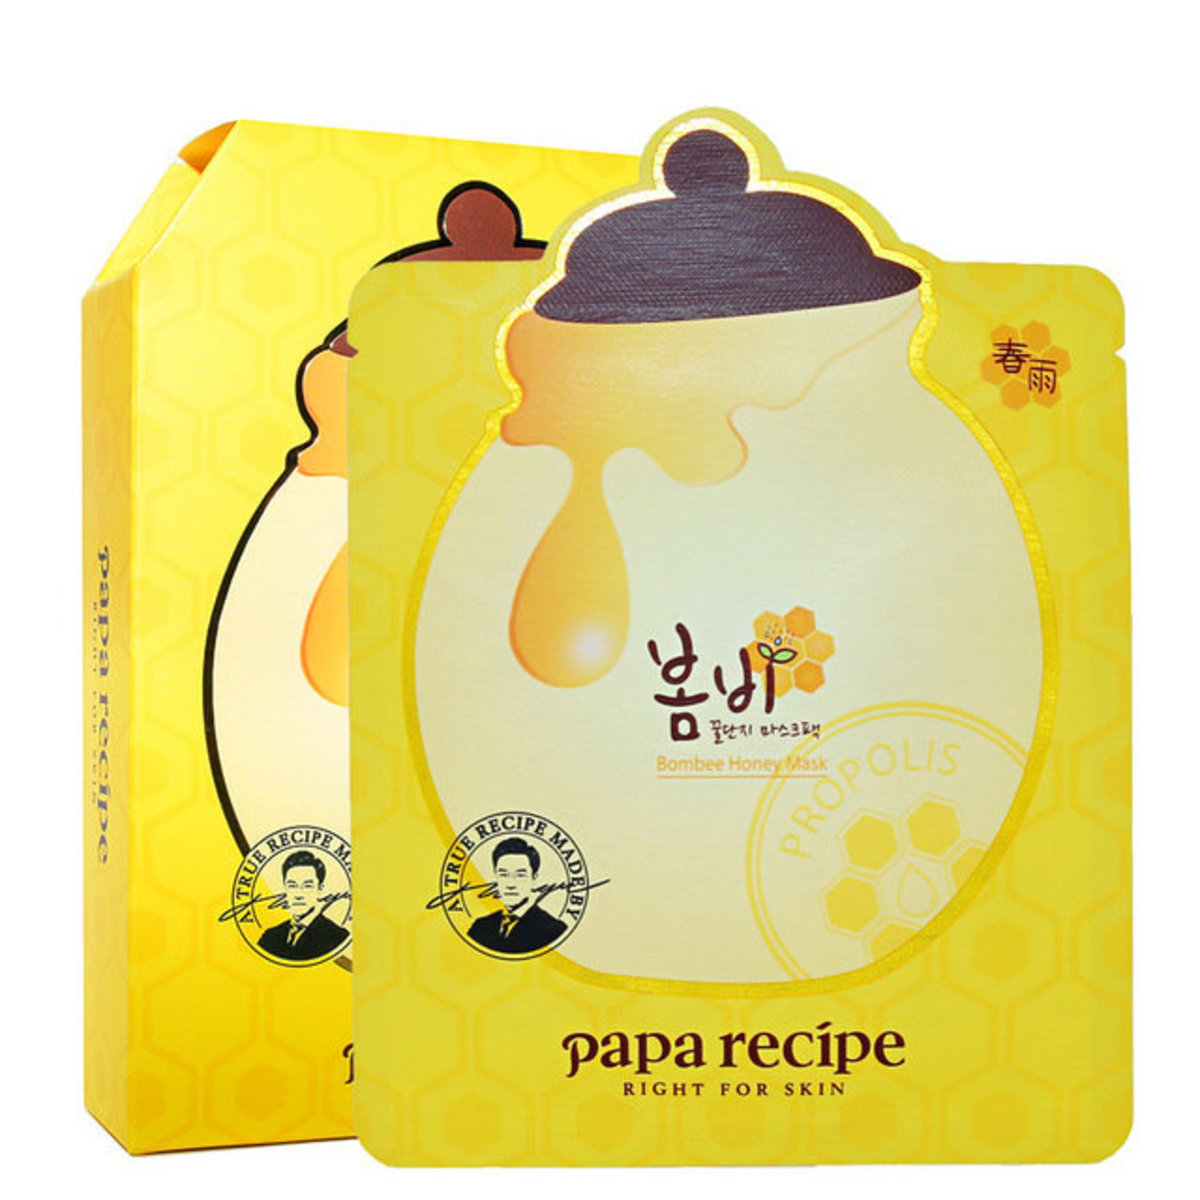 Bombee Honey Mask (10pcs/Box) [Parallel Import]